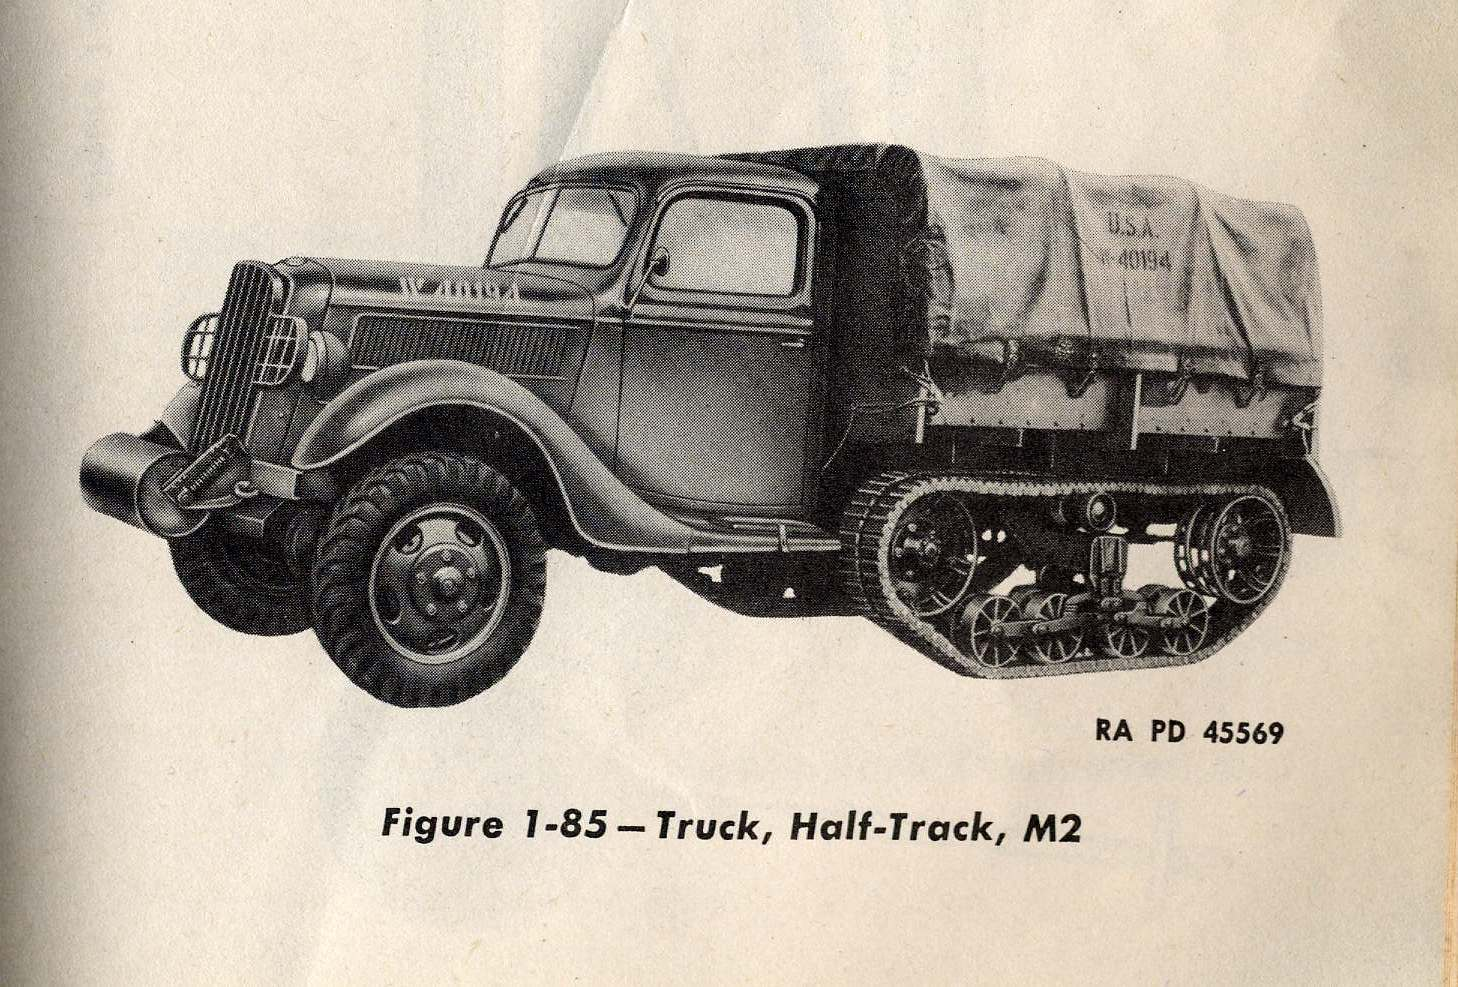 File:M2 truck halftrack jpg - Wikimedia Commons